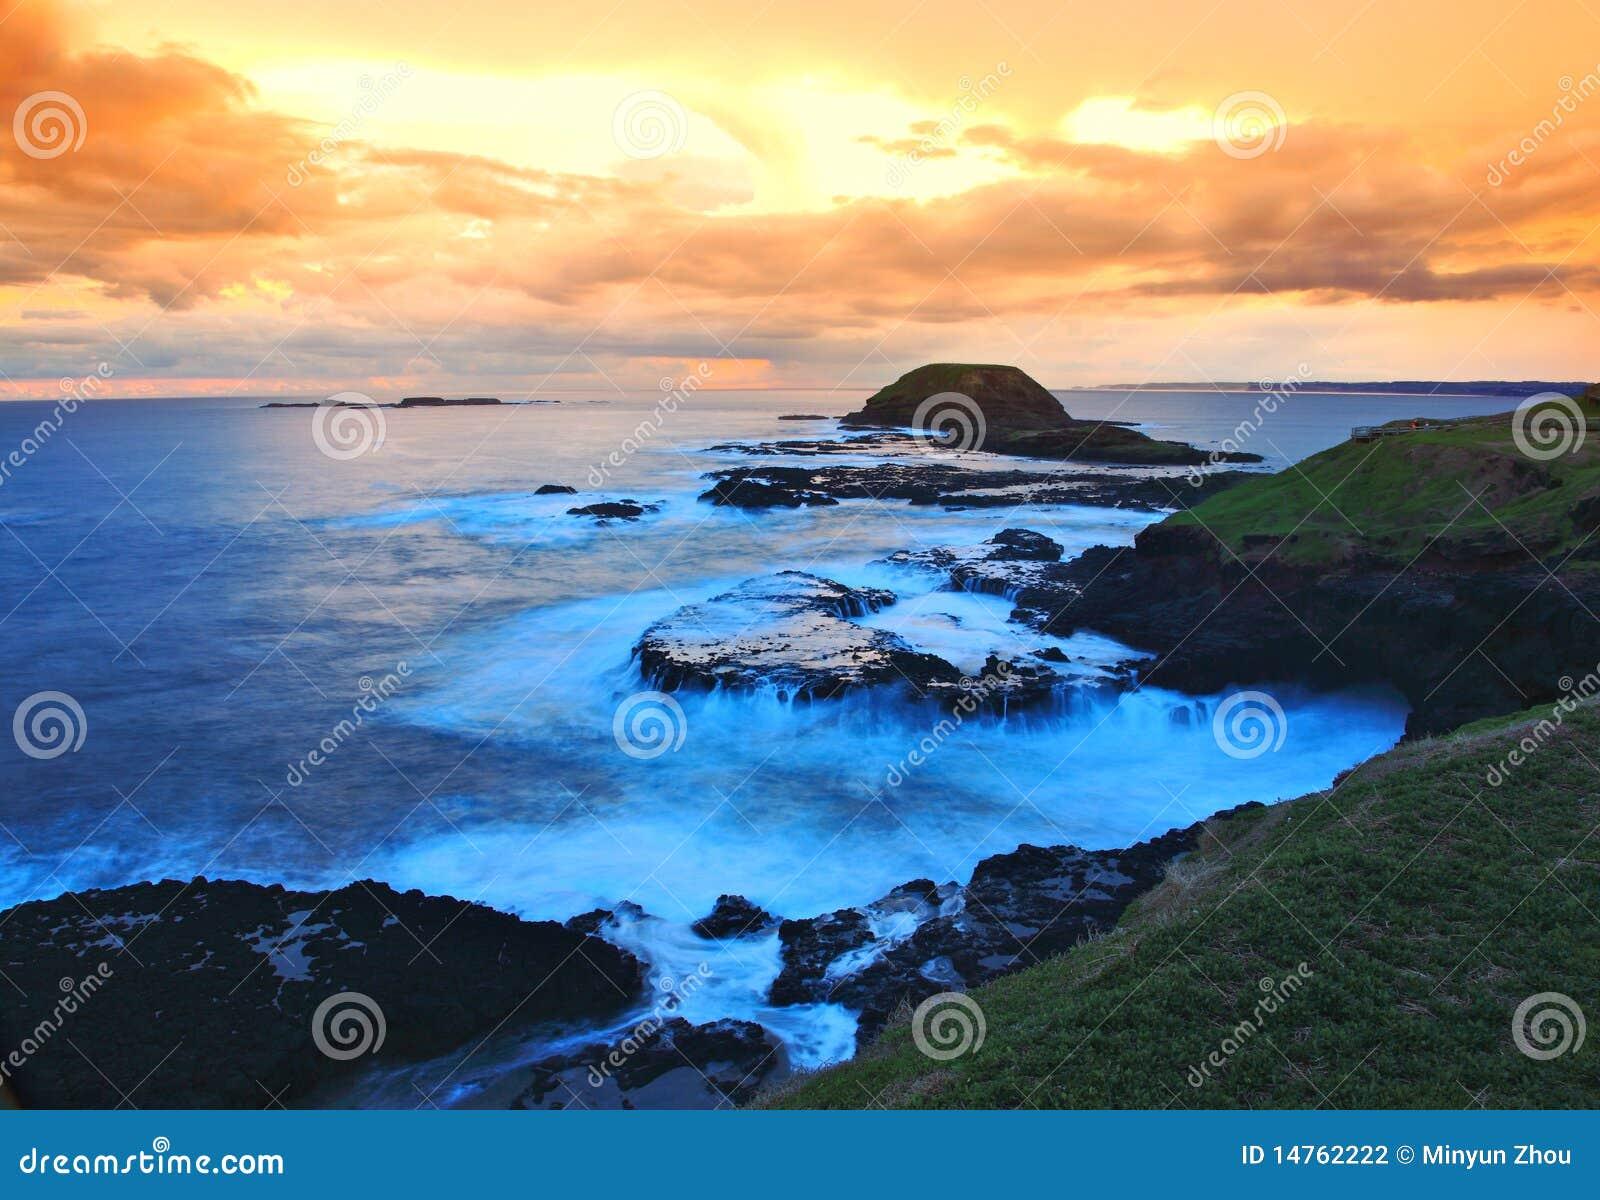 Phillip Island.melbourne